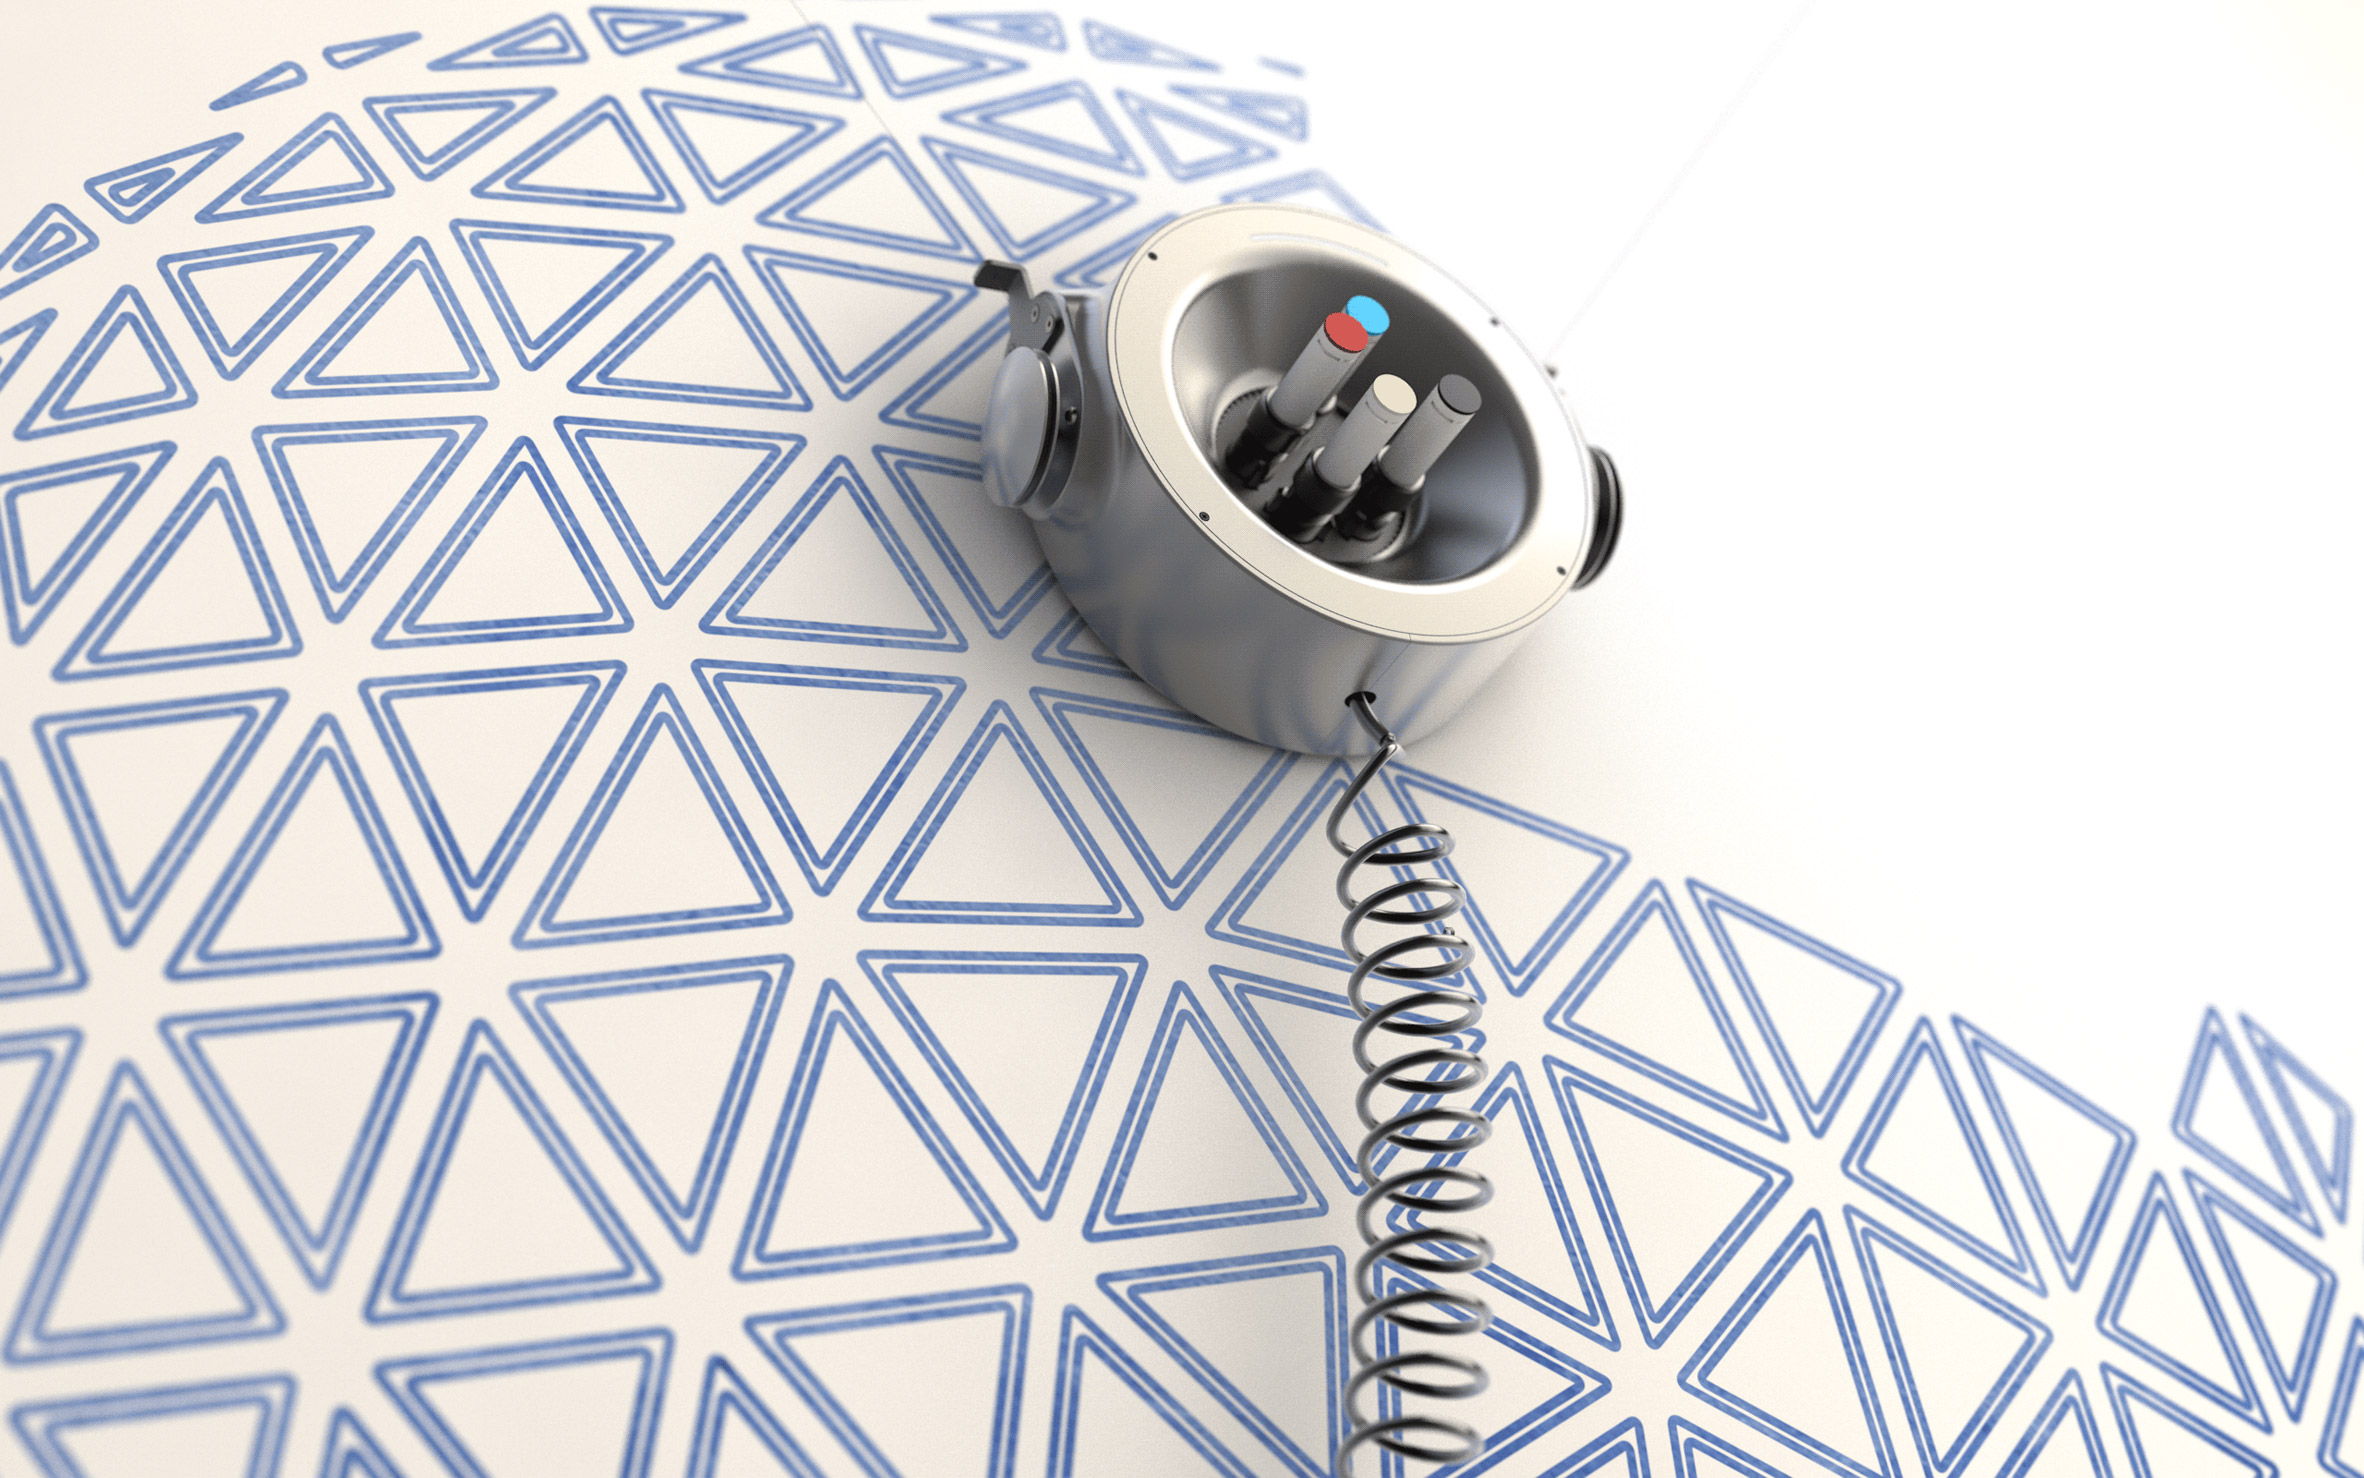 Carlo Ratti's scribing robot turns walls into